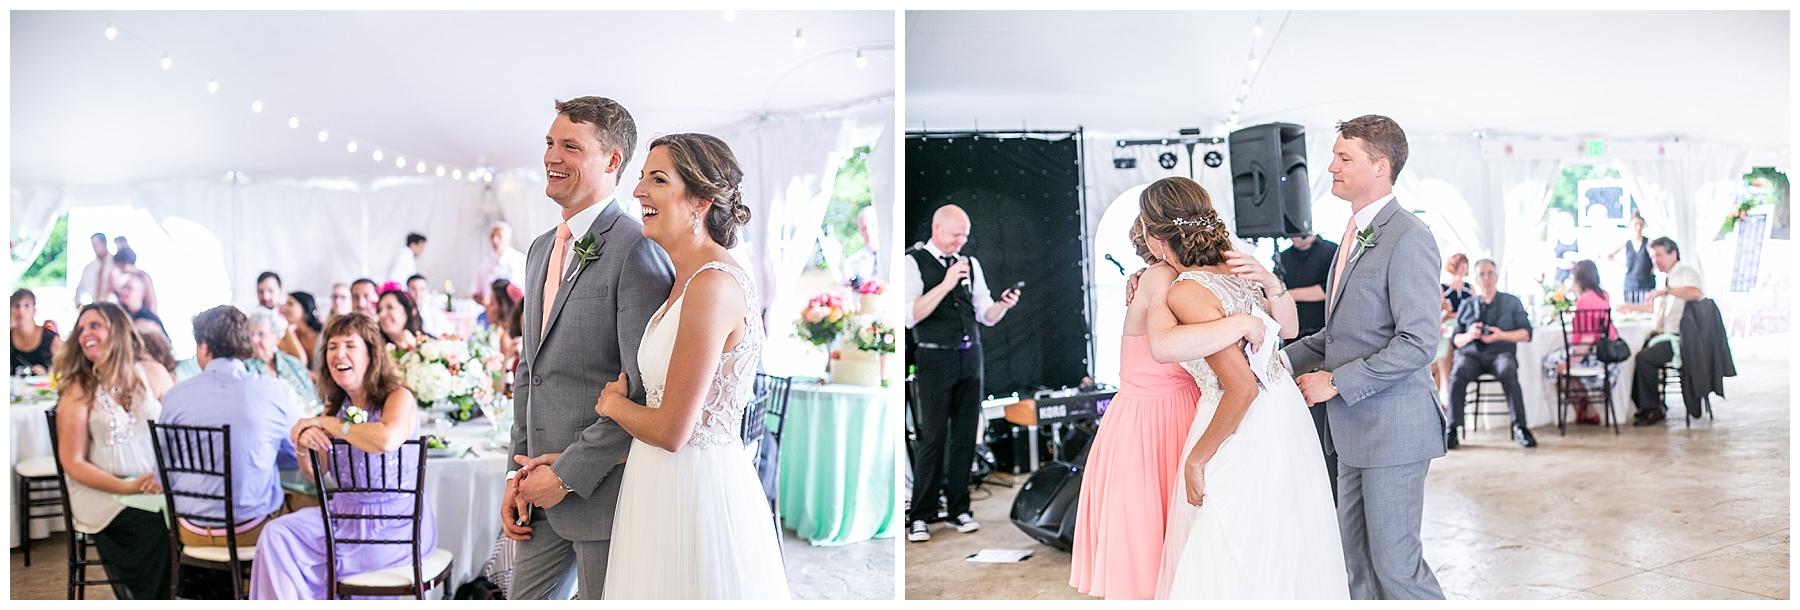 Chelsea Phil Bohemia River Overlook Wedding Living Radiant Photography photos_0144.jpg